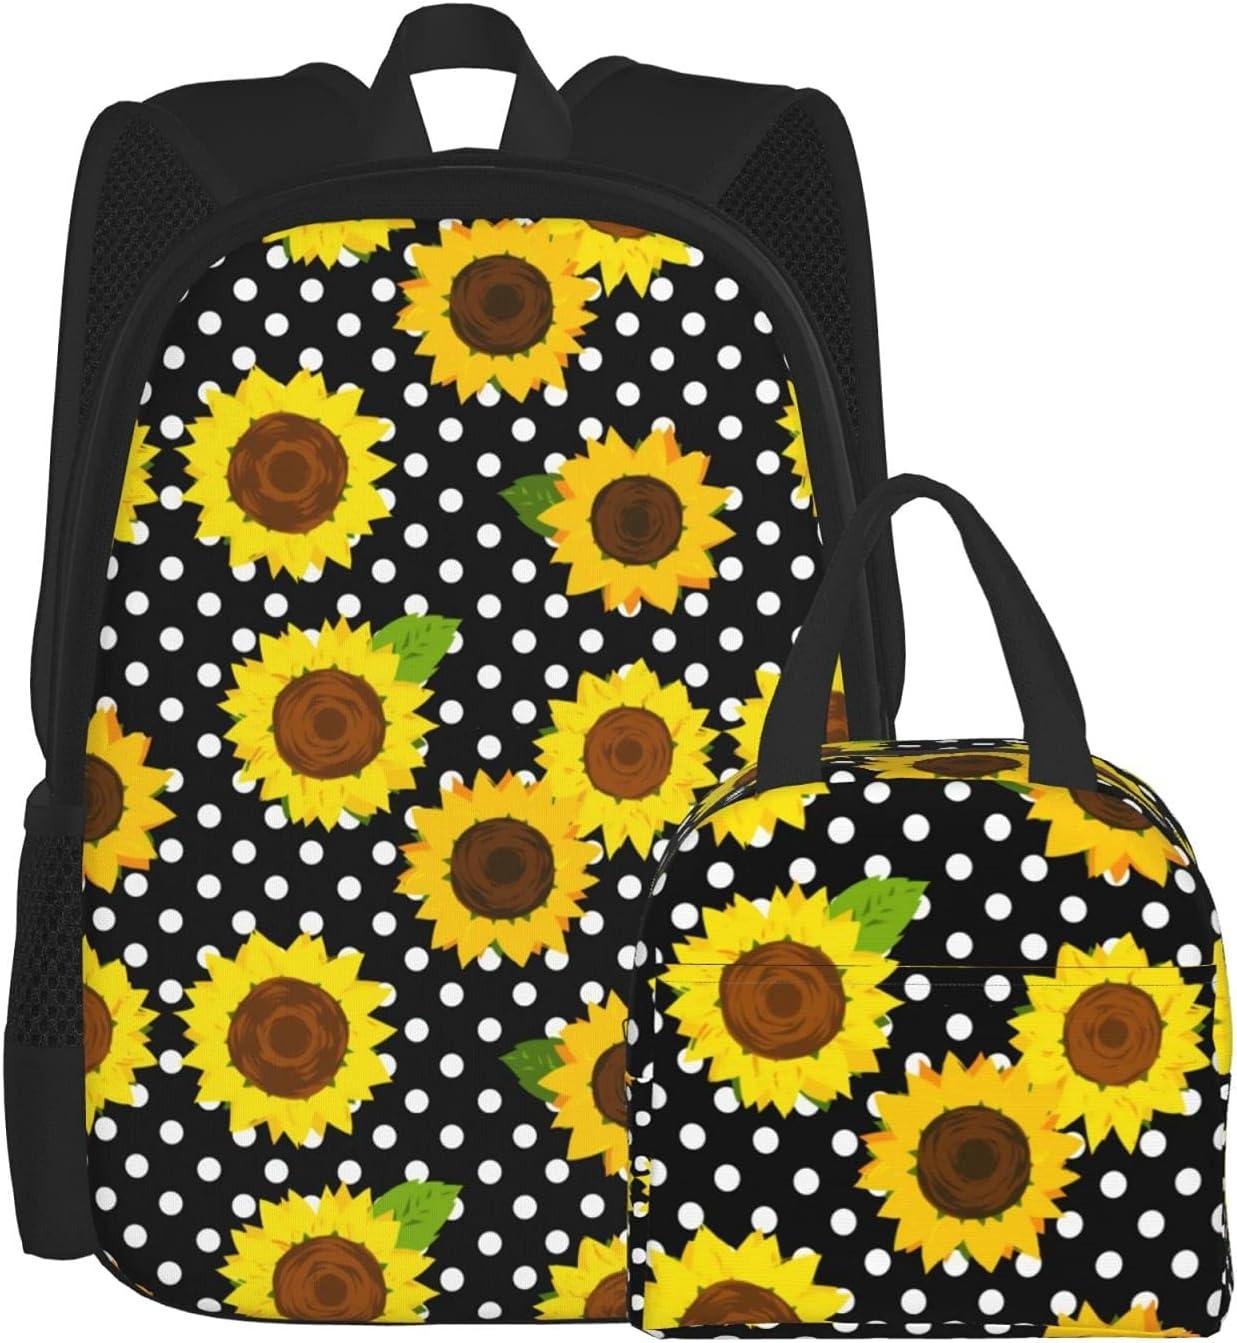 Backpack Lunch Bag Sets for Boys shipfree Trendy Girls Backpa New sales Sunflower